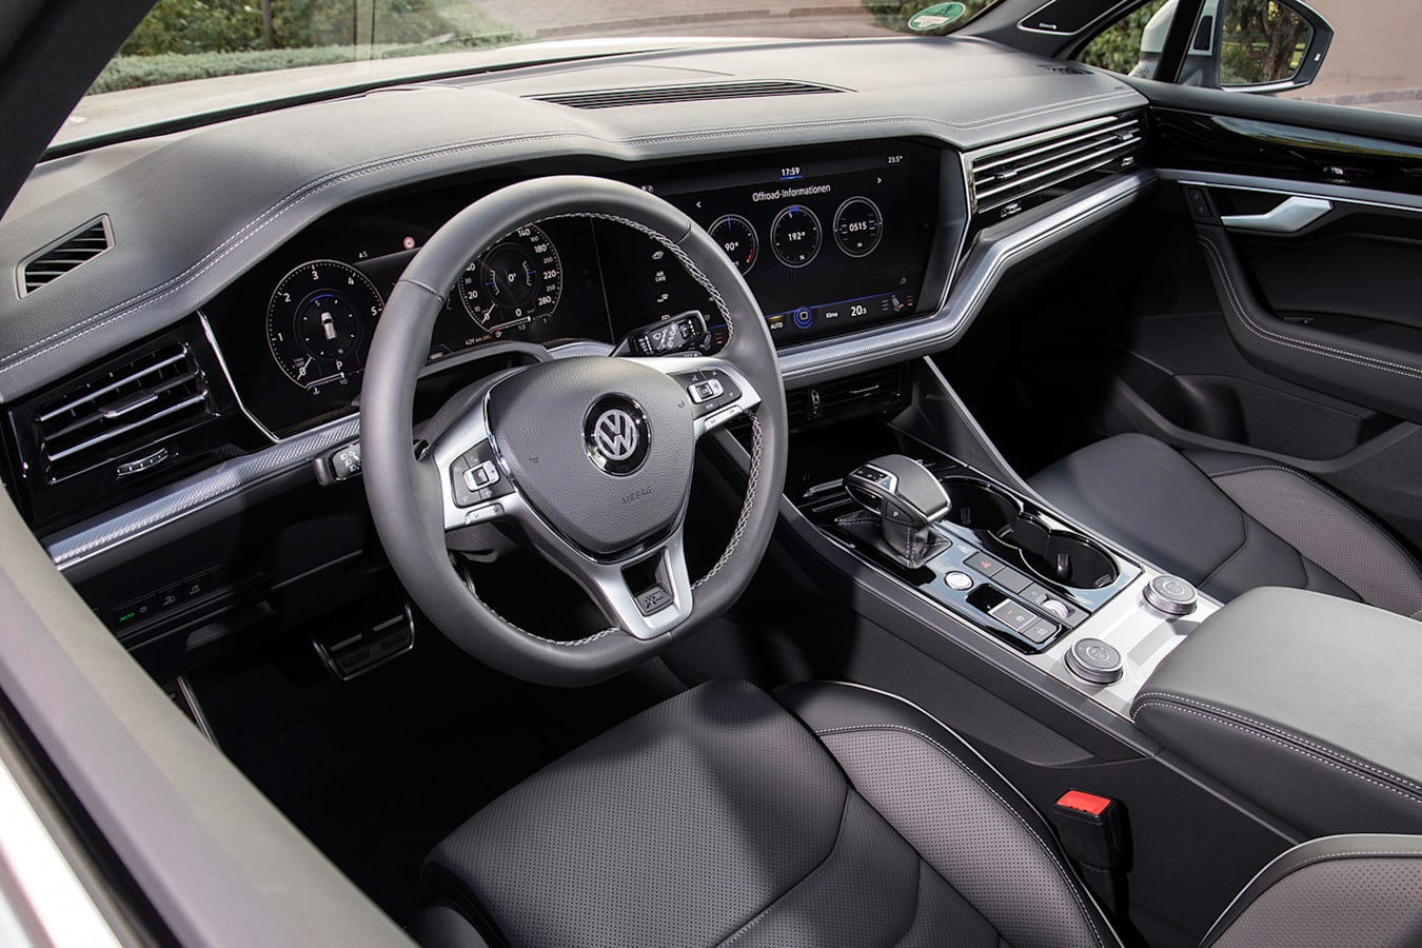 Volkswagen Touareg Interior Jpg